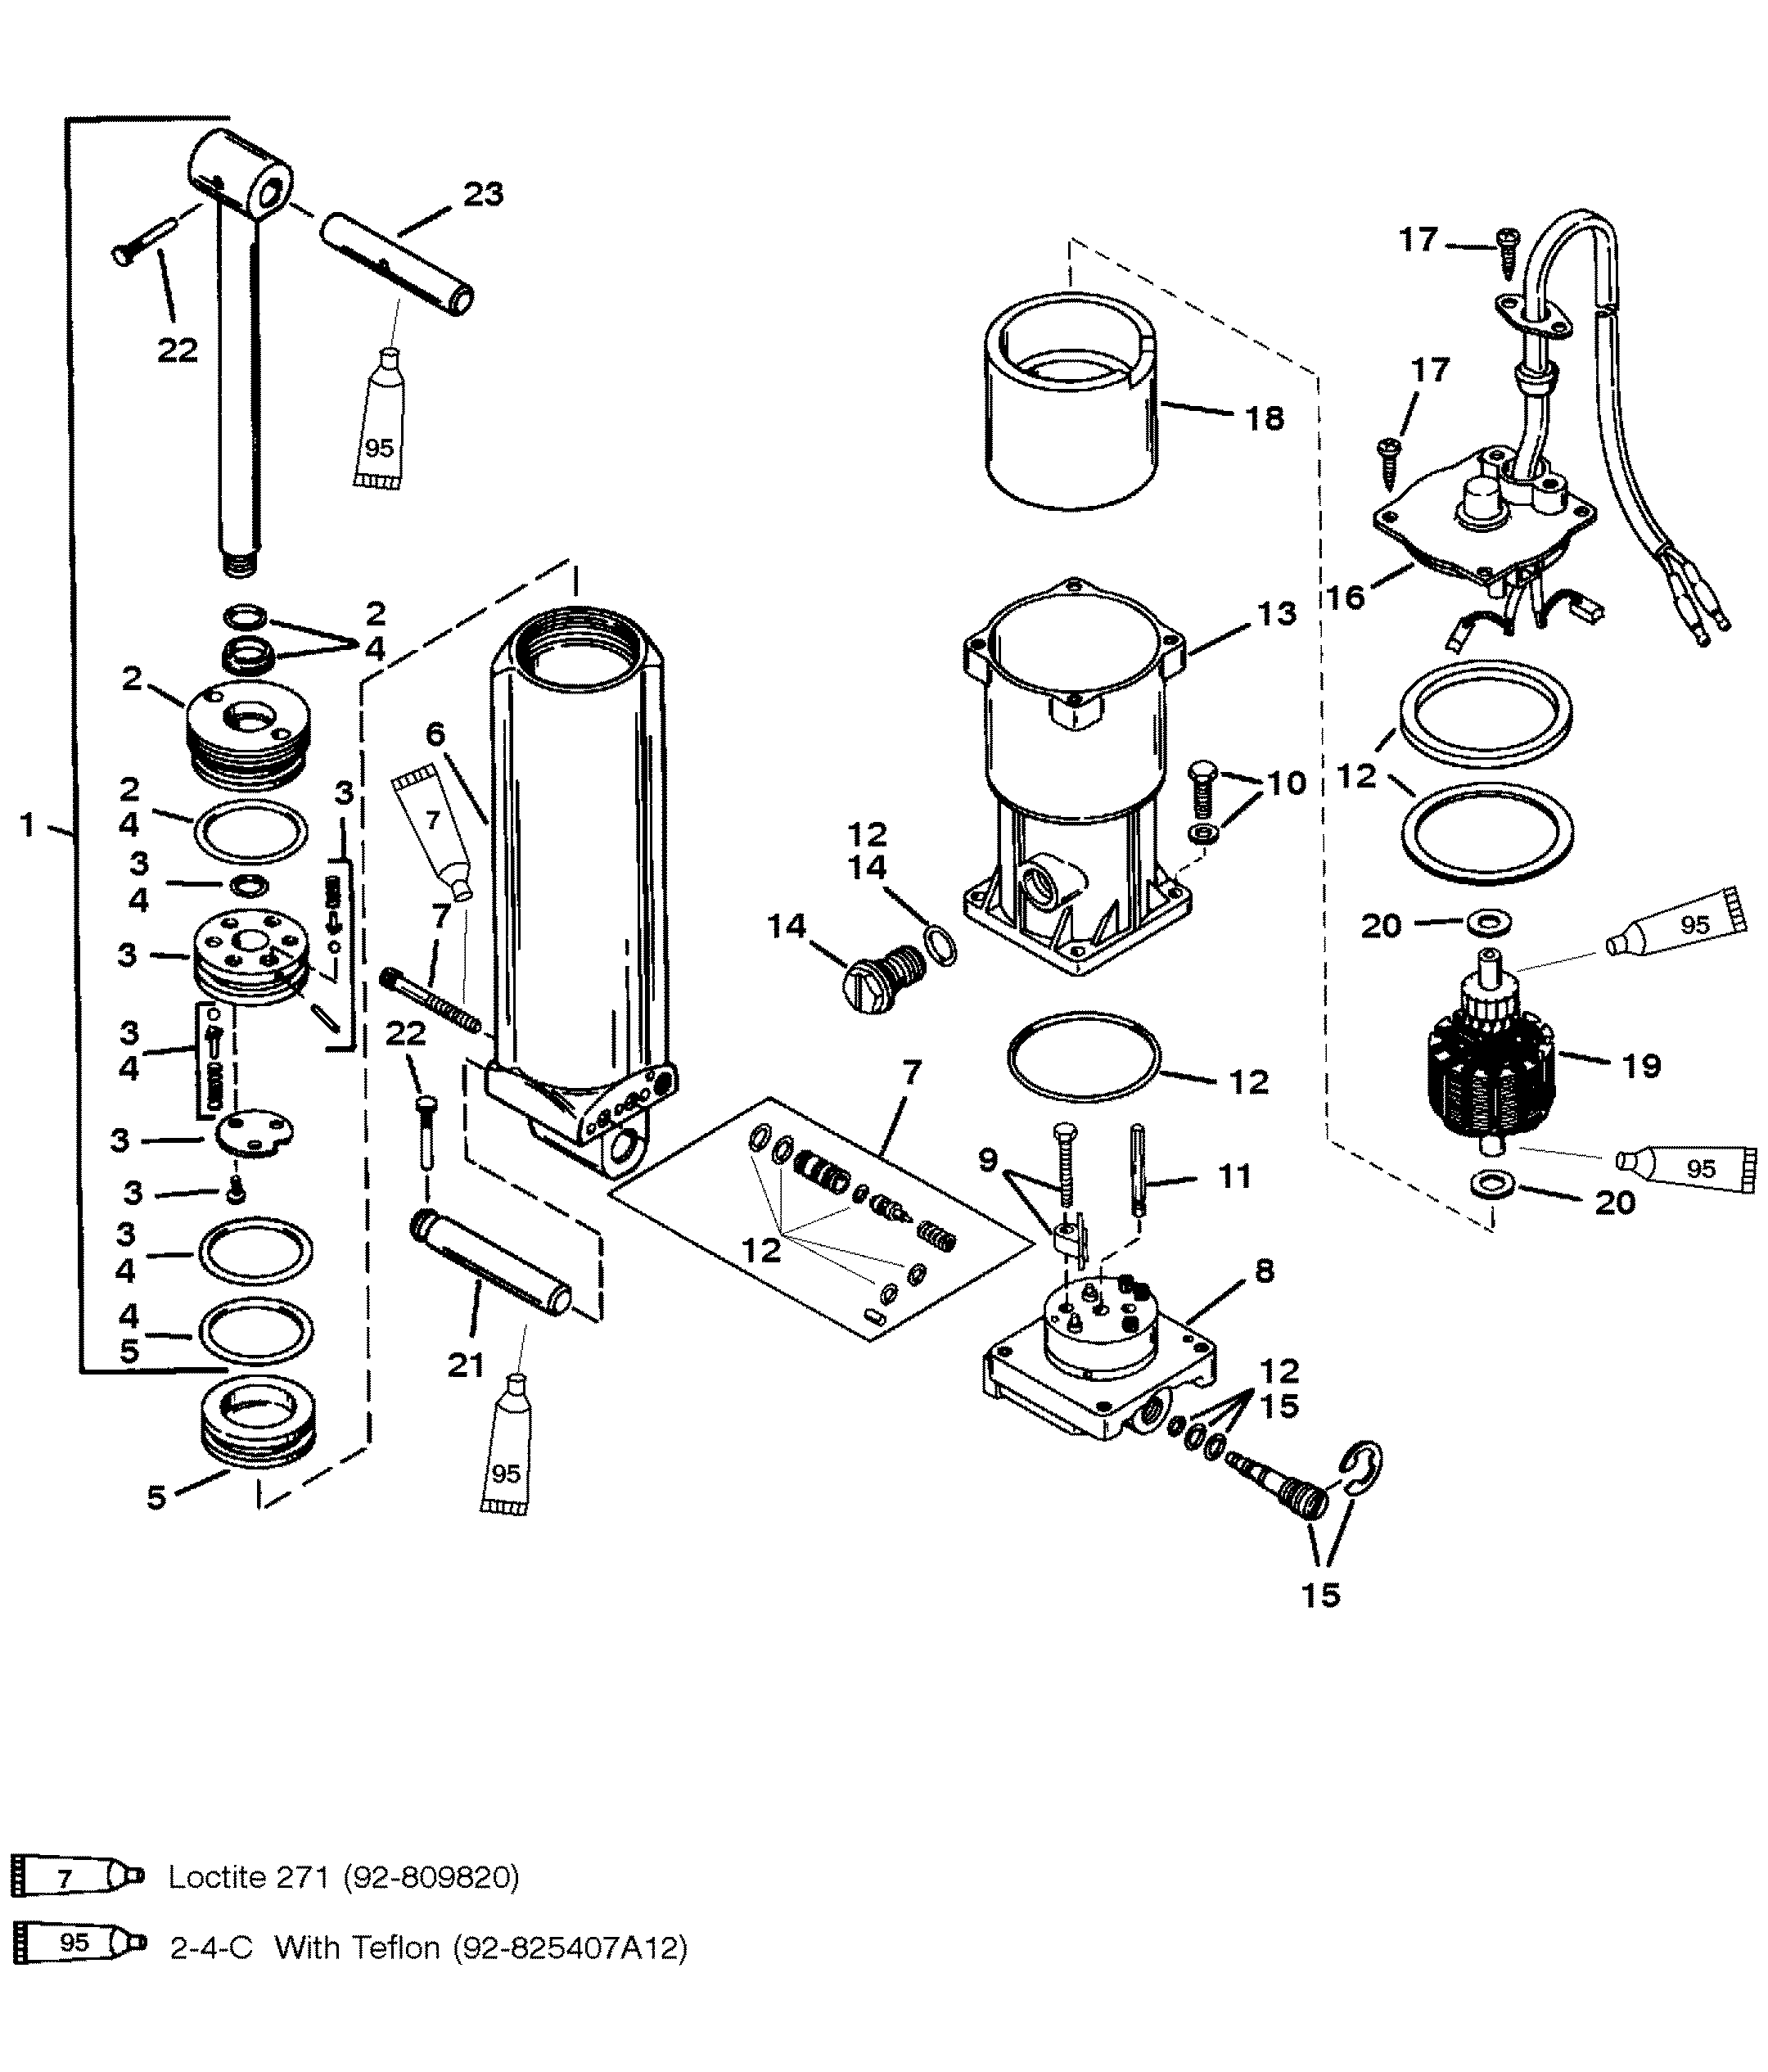 Mercruiser Tilt Trim Diagram Wiring Diagram Option